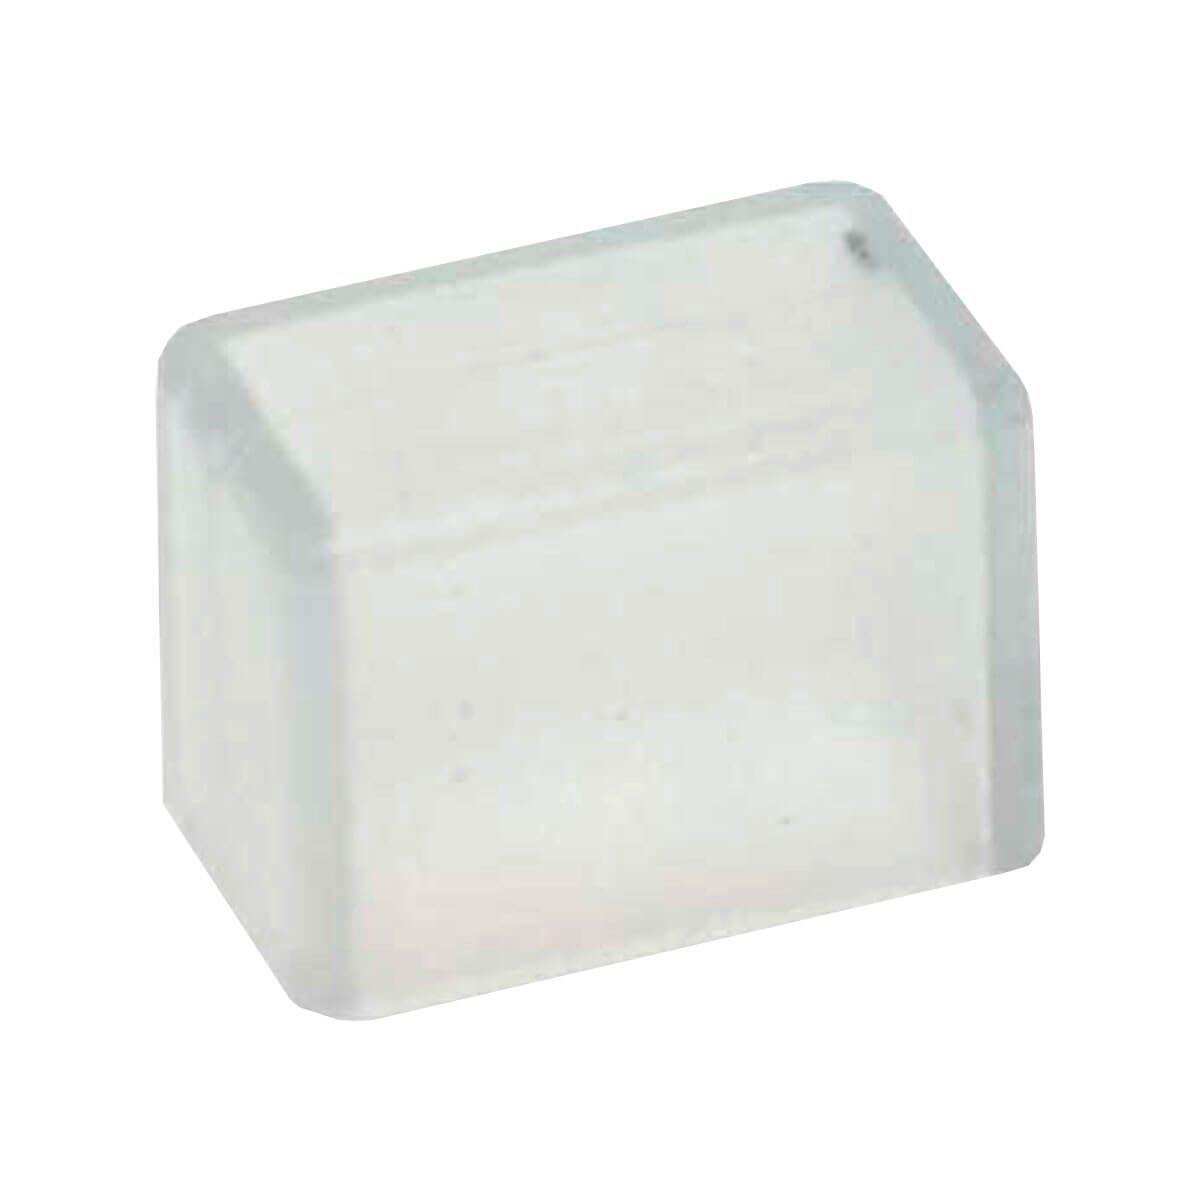 Заглушка для светодиодного неона 14x26